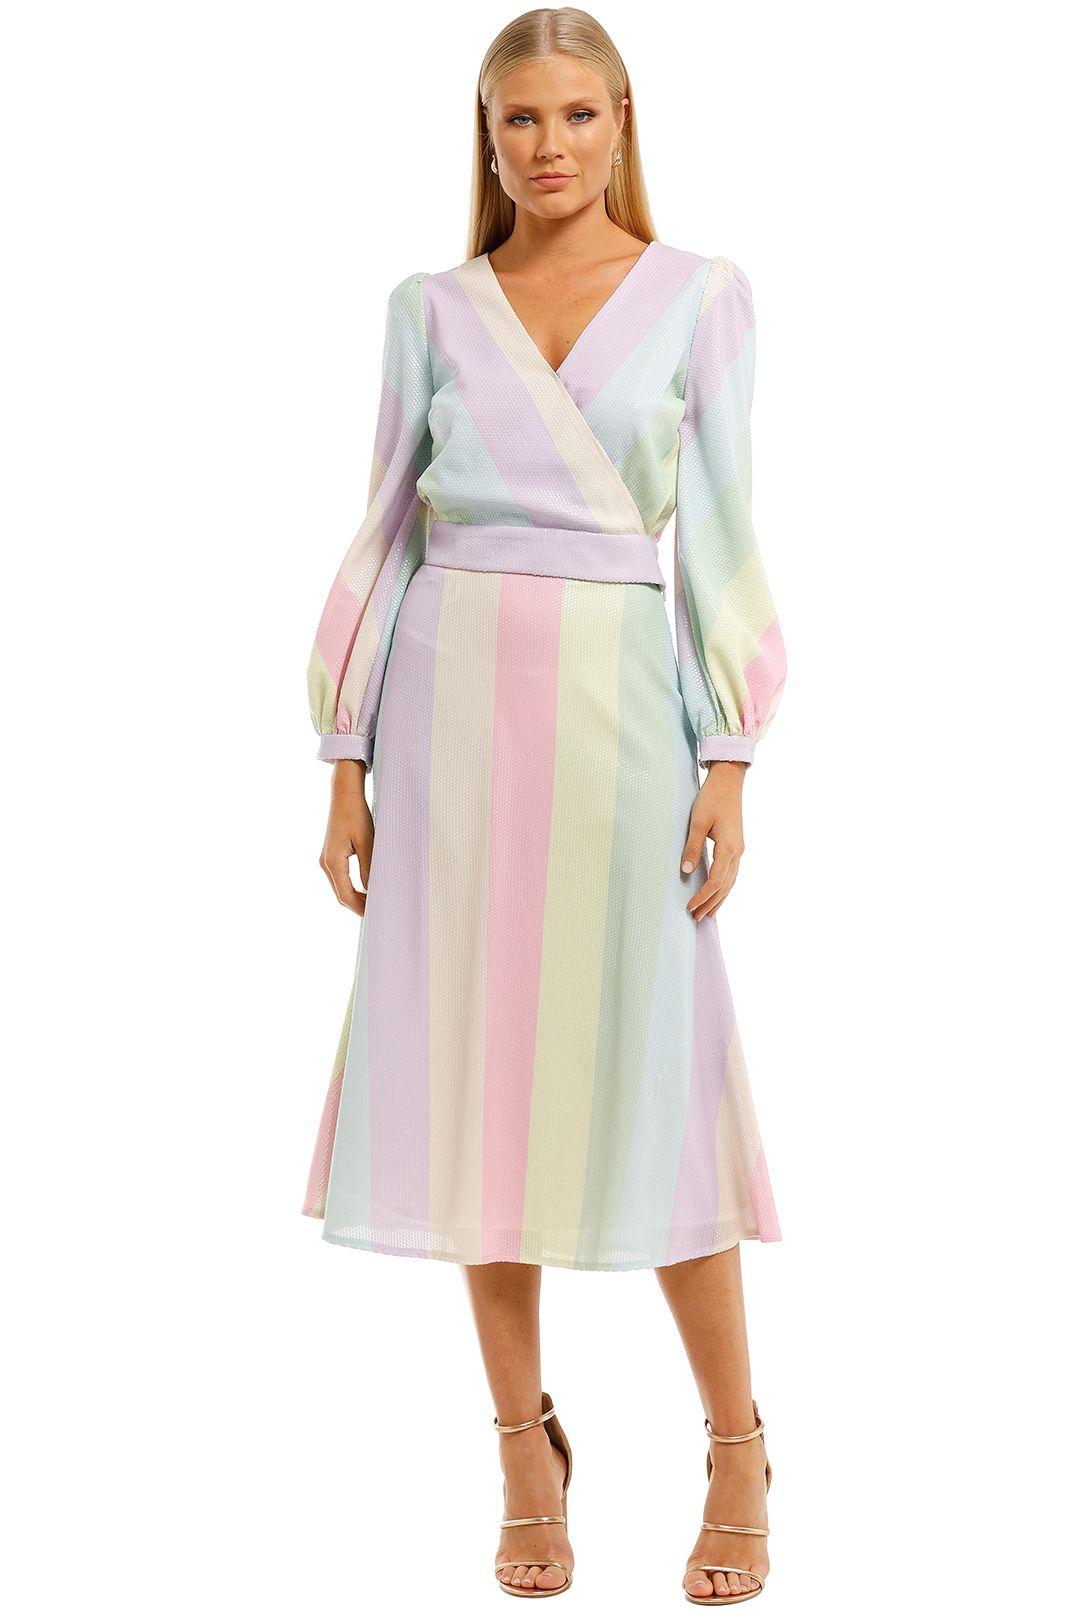 Olivia-Rubin-Neapolitan-Crop-Top-and-Skirt-Set-Multi-Front